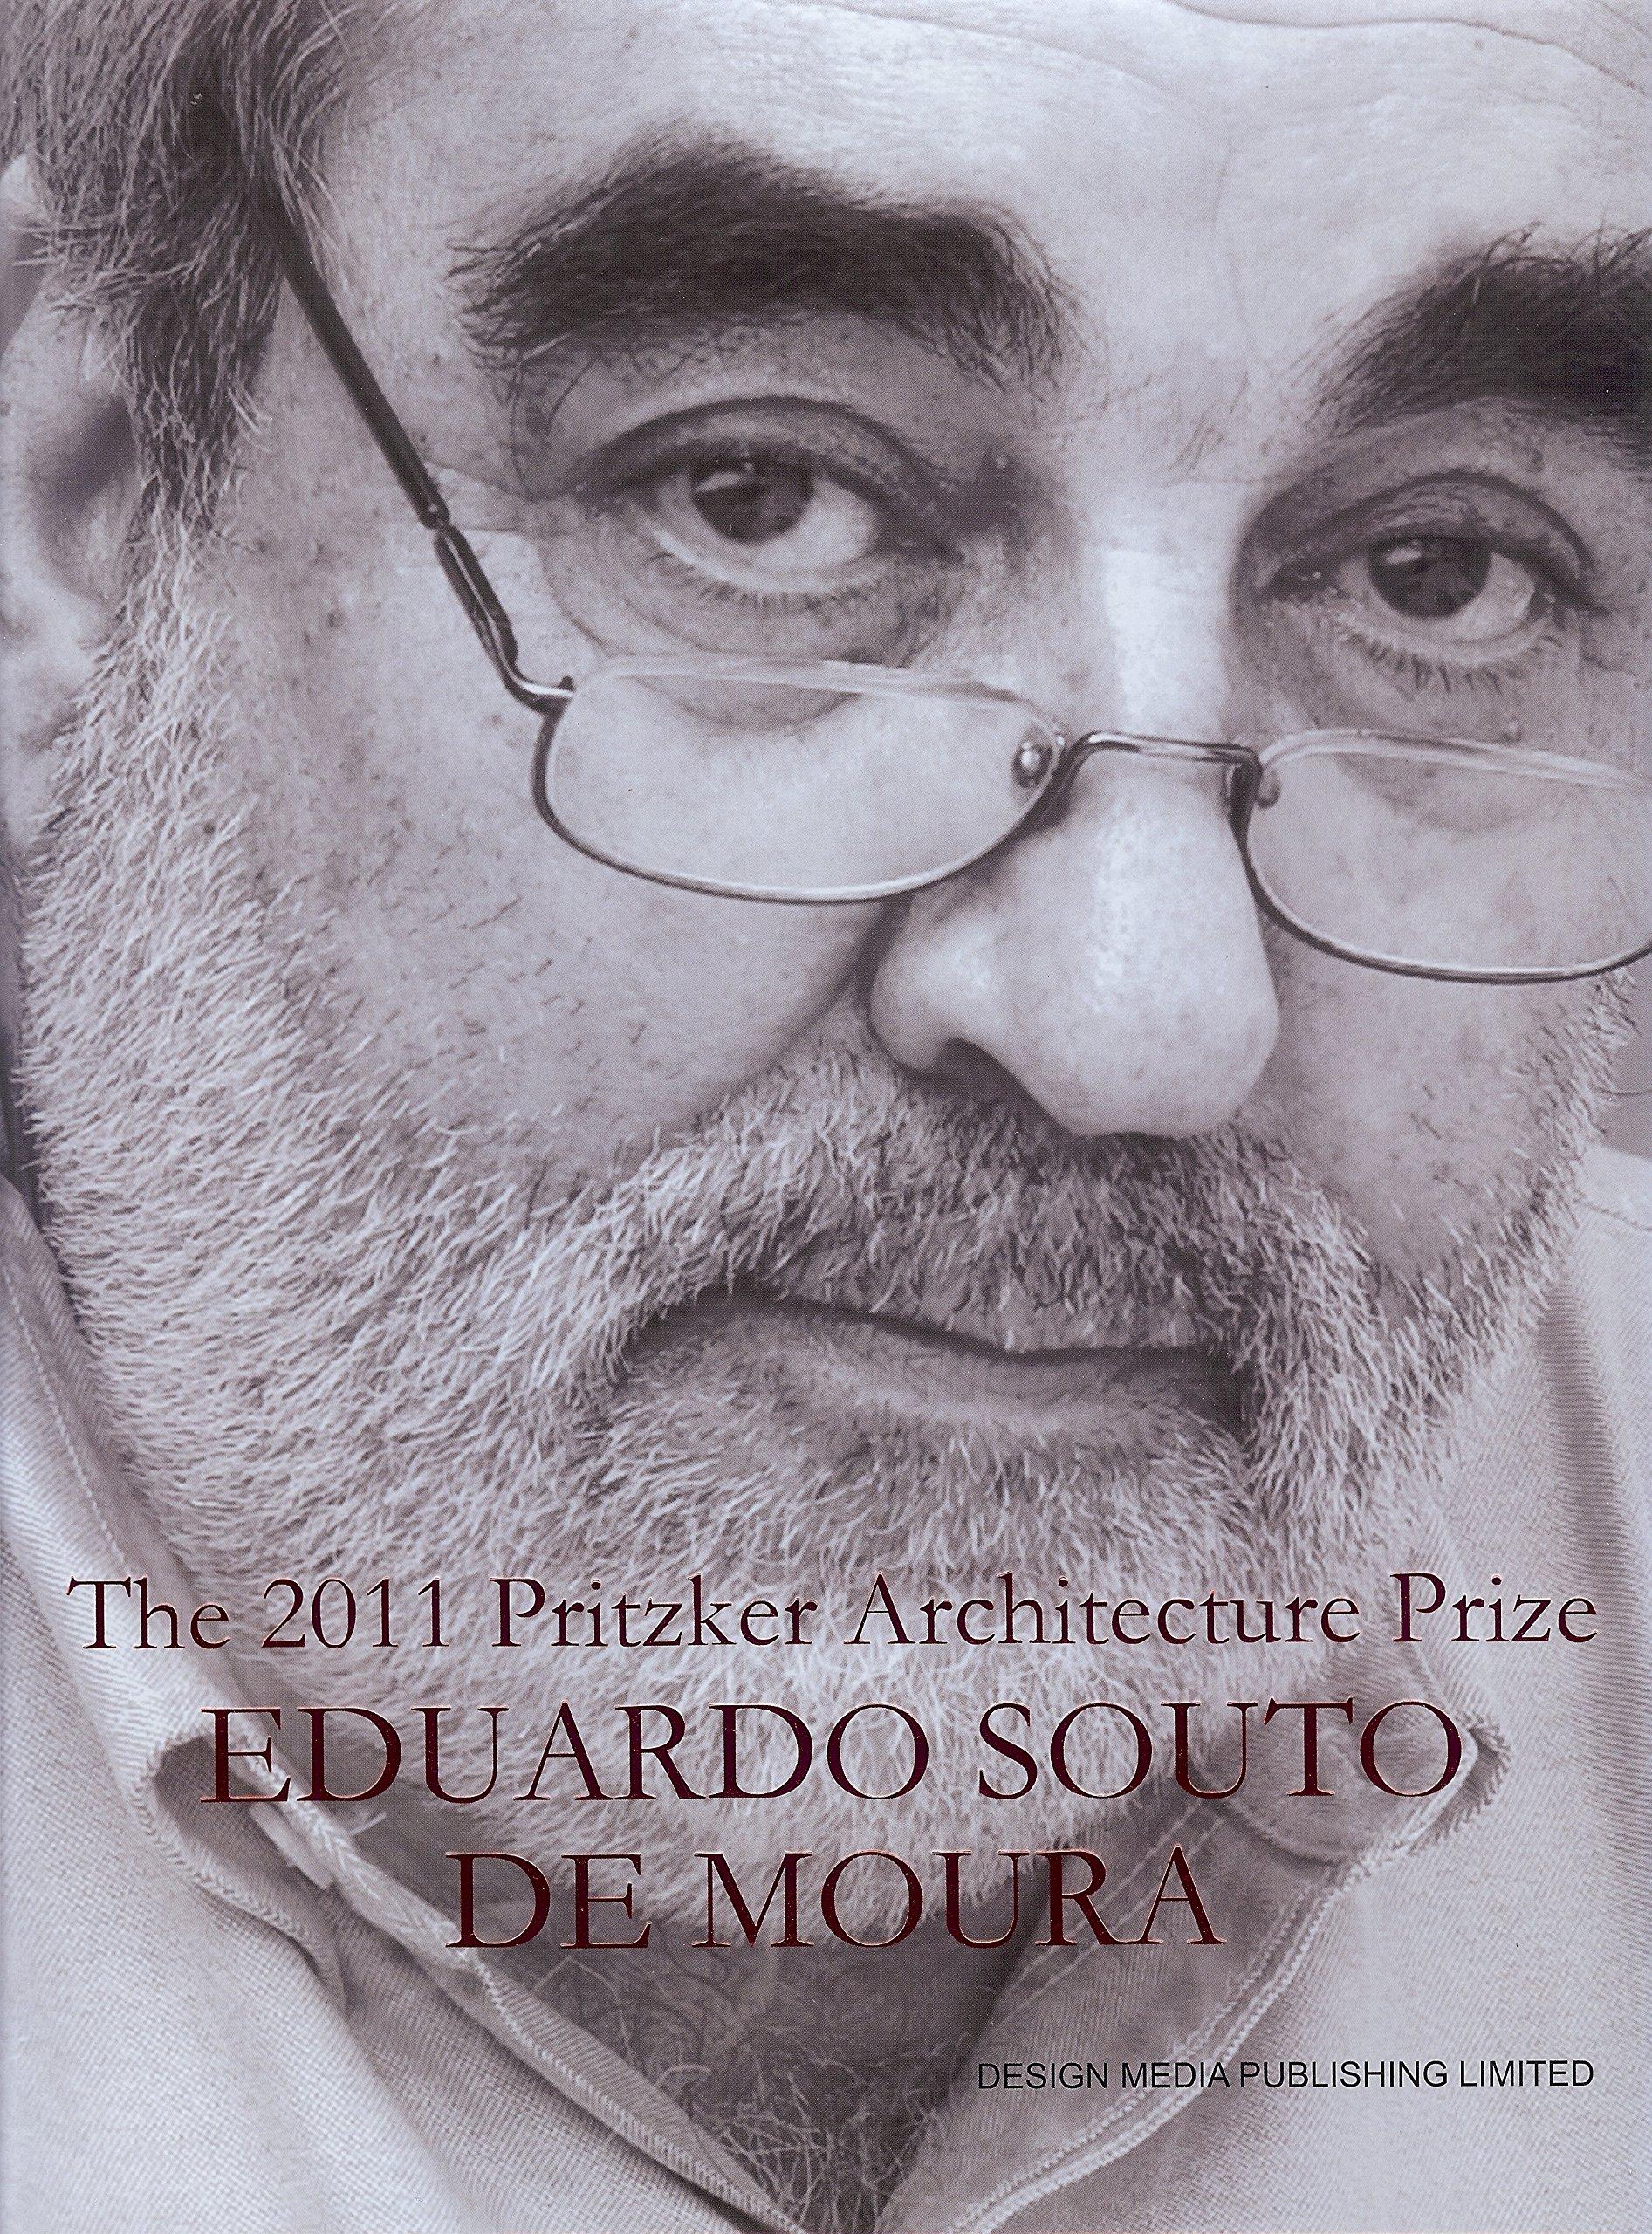 The 2011 Pritzker Architecture Prize : Eduardo Souto de Moura PDF